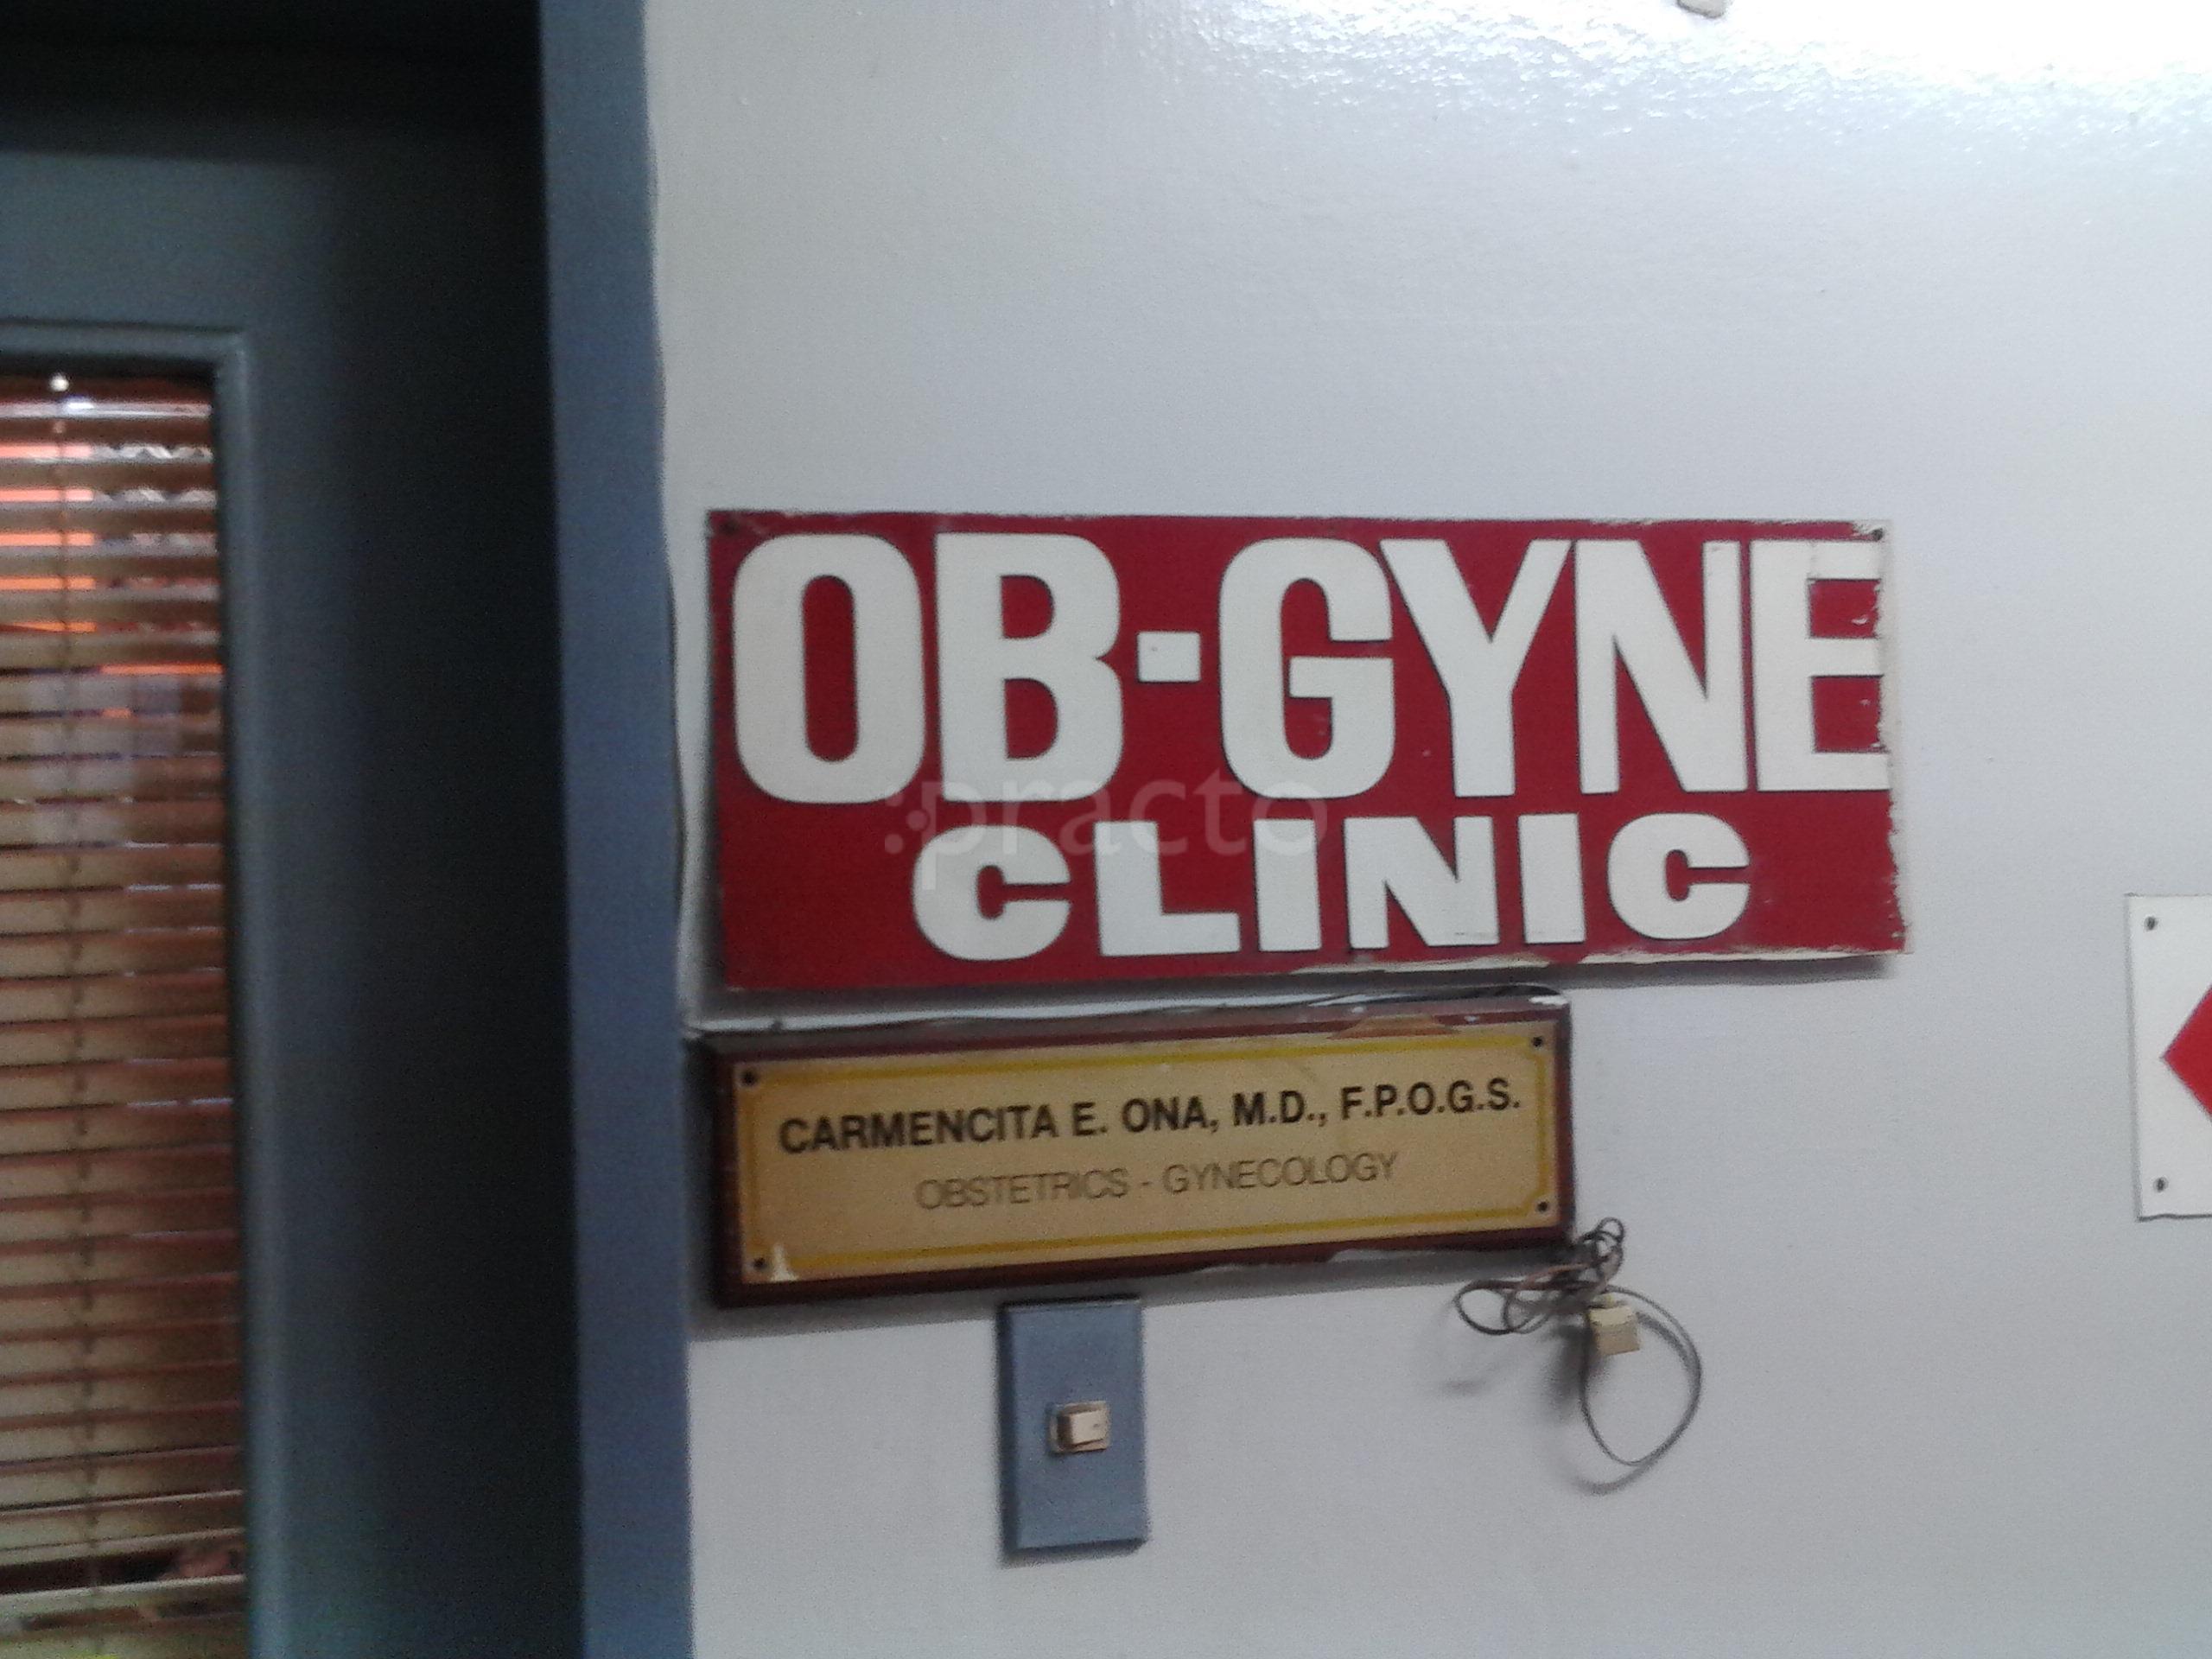 Follicular Scan Treatment In Manila - Check & Compare Prices